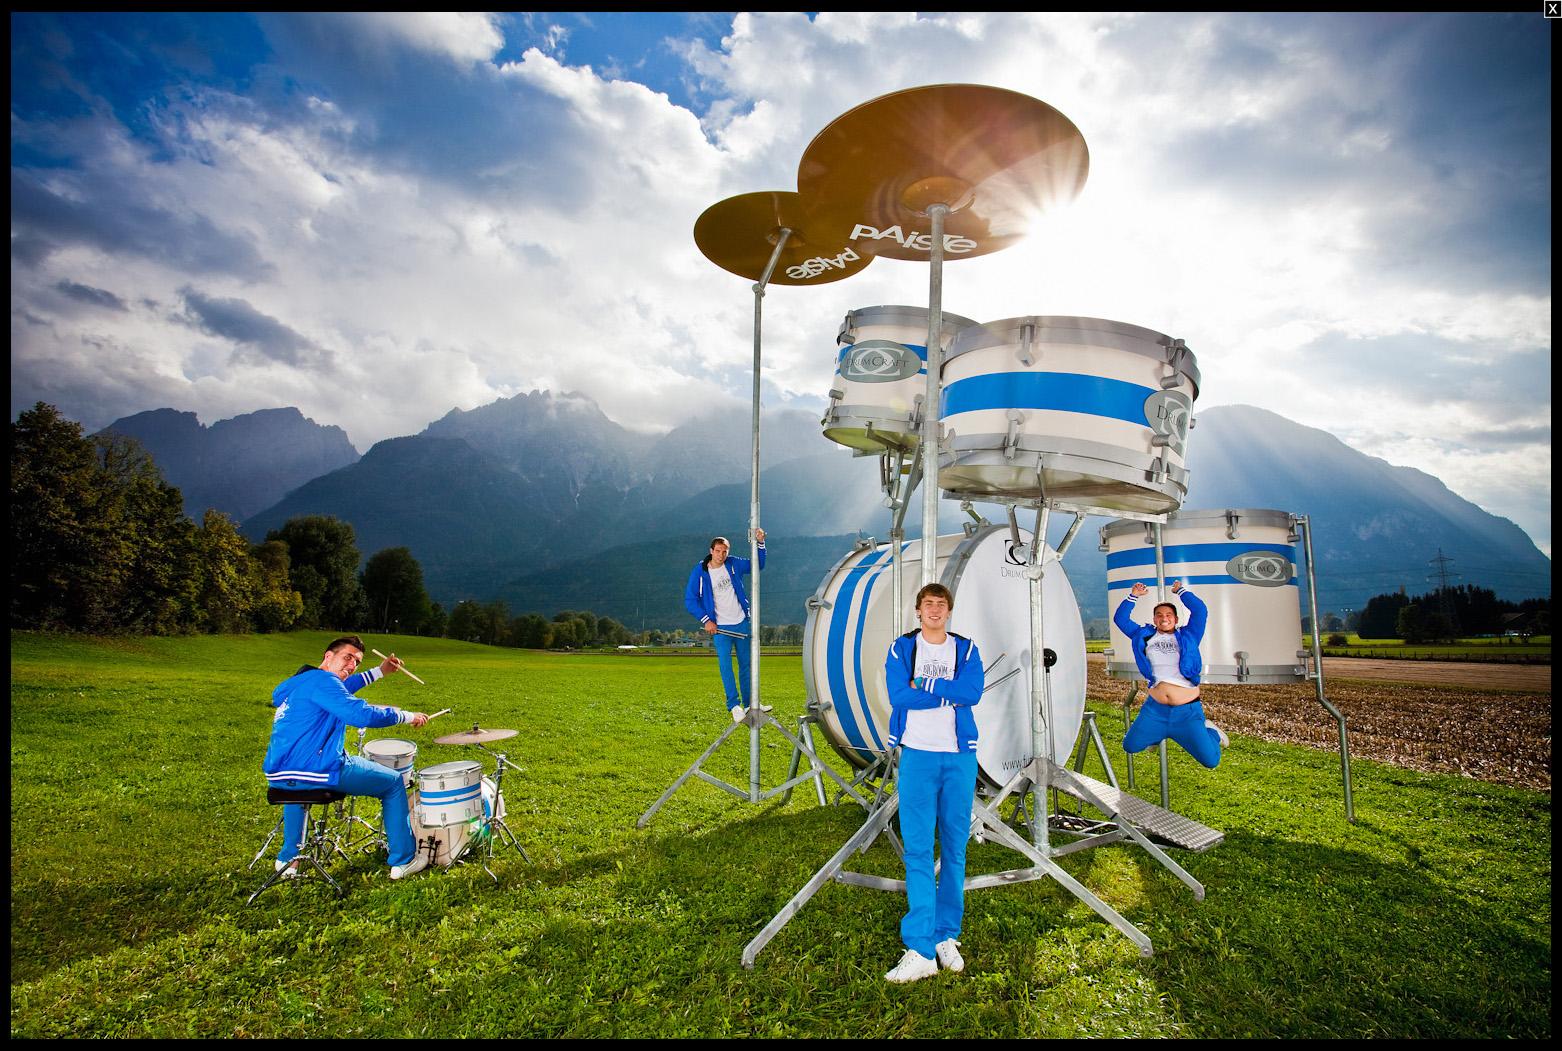 World's Largest Drum Kit